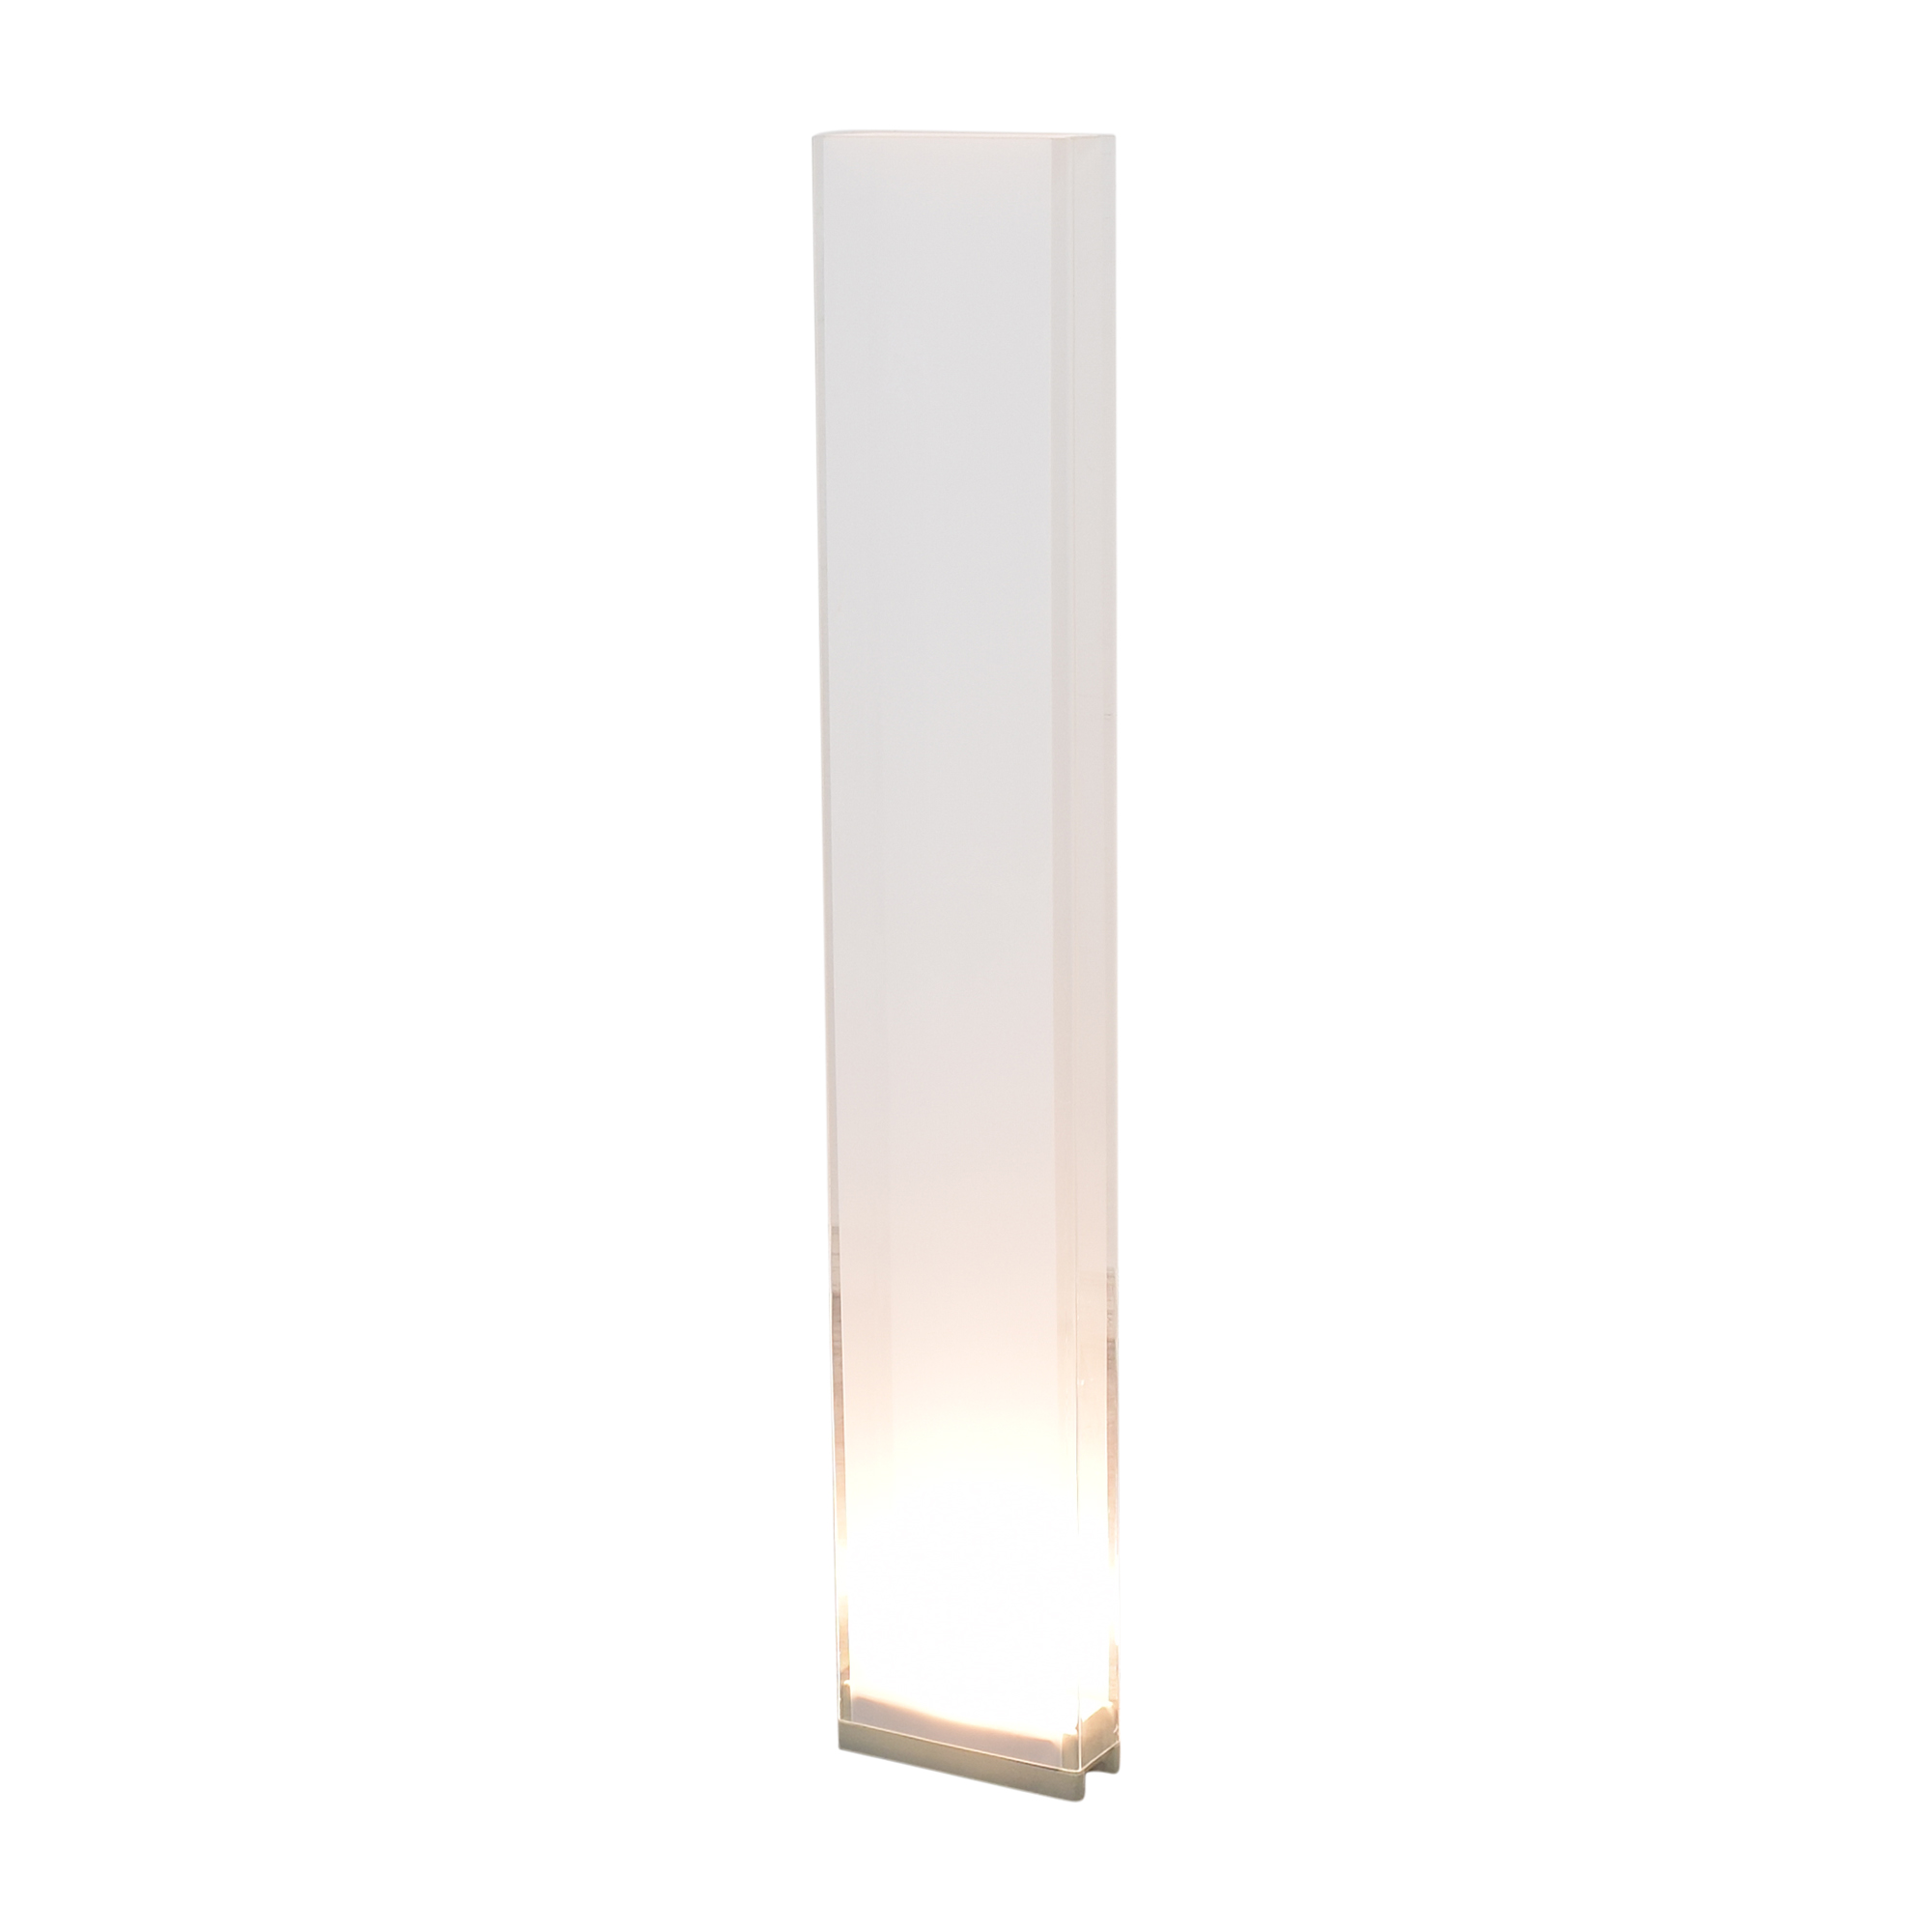 43 Off Pablo Designs Pablo Designs Cortina Modern Floor Lamp Decor